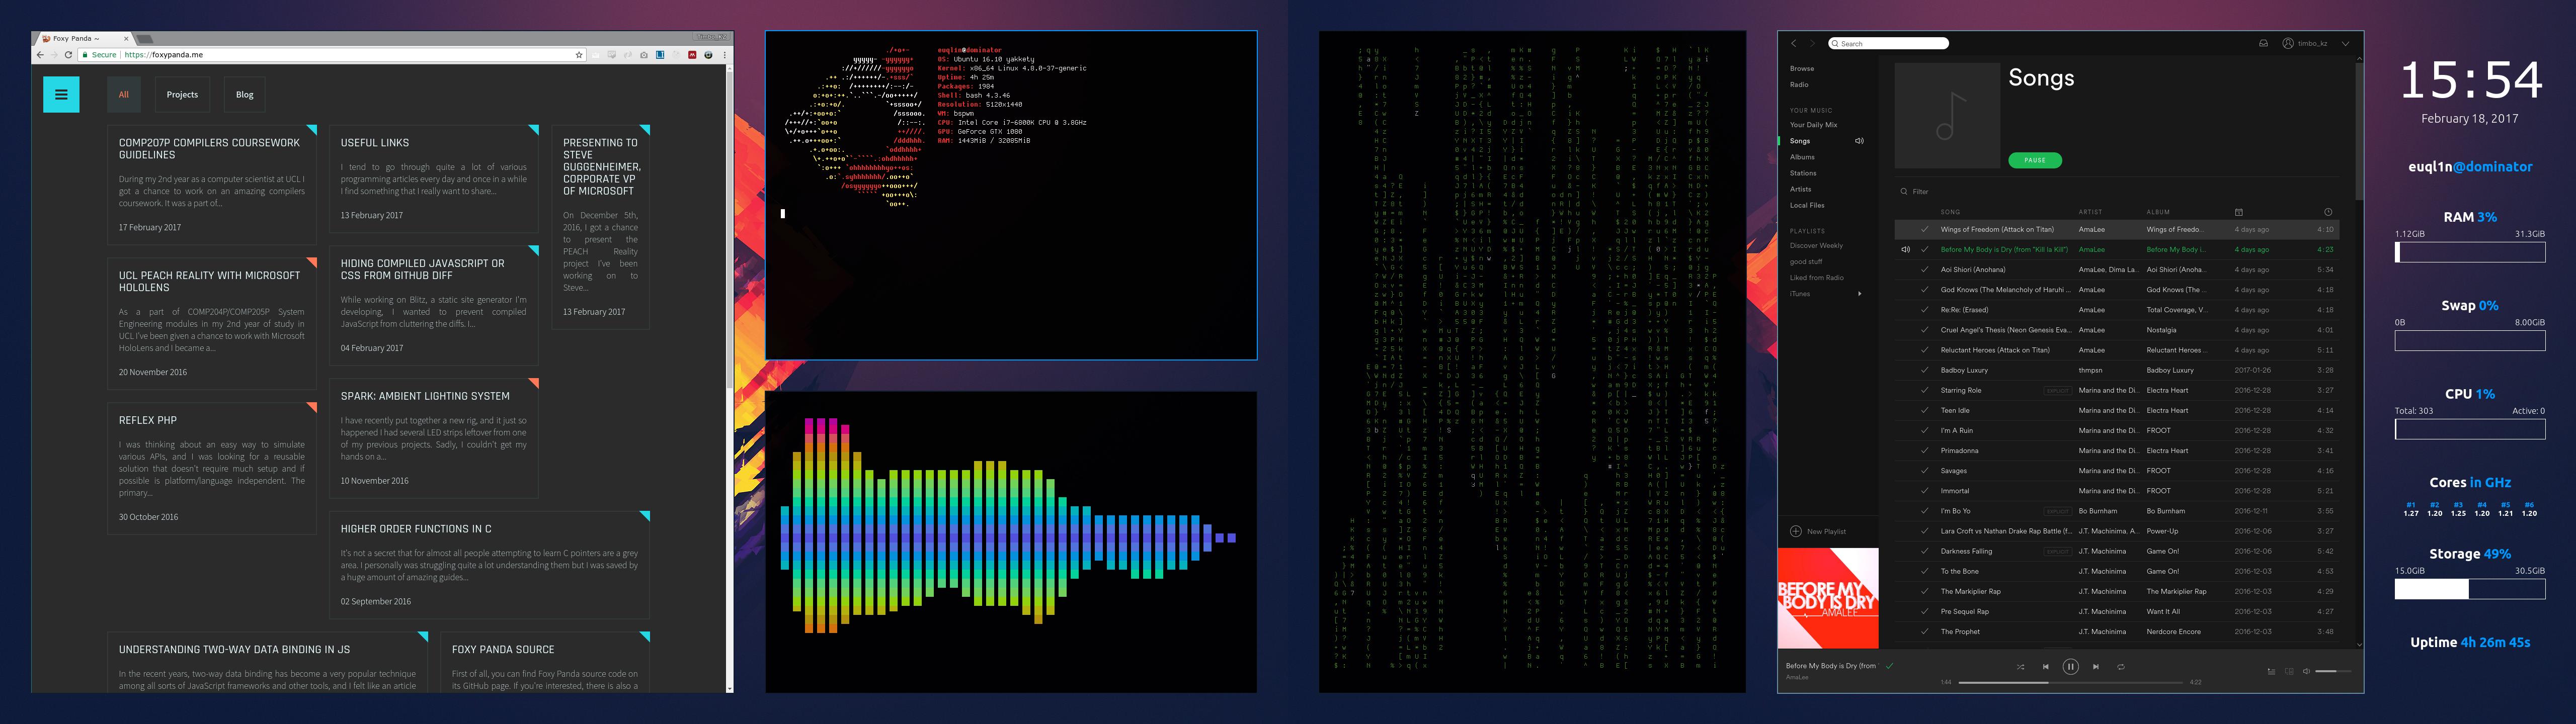 Tim's Ubuntu 16.10 setup using bspwm